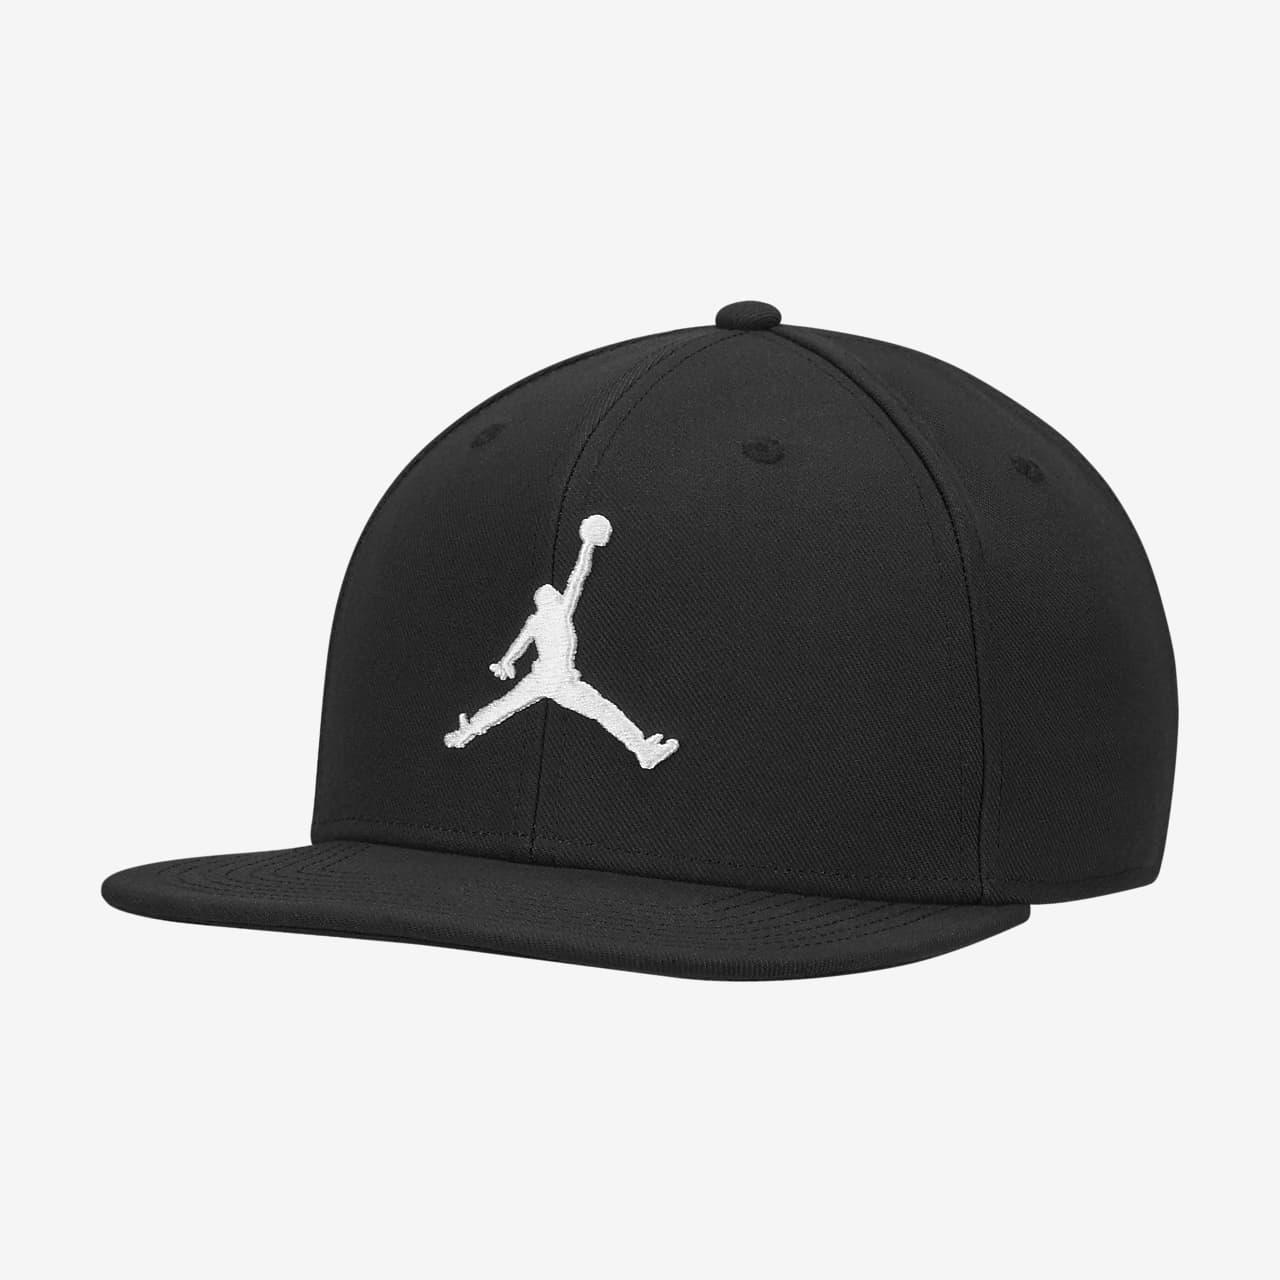 90b17d49ca7 Jordan Pro Jumpman Snapback Hat. Nike.com AU